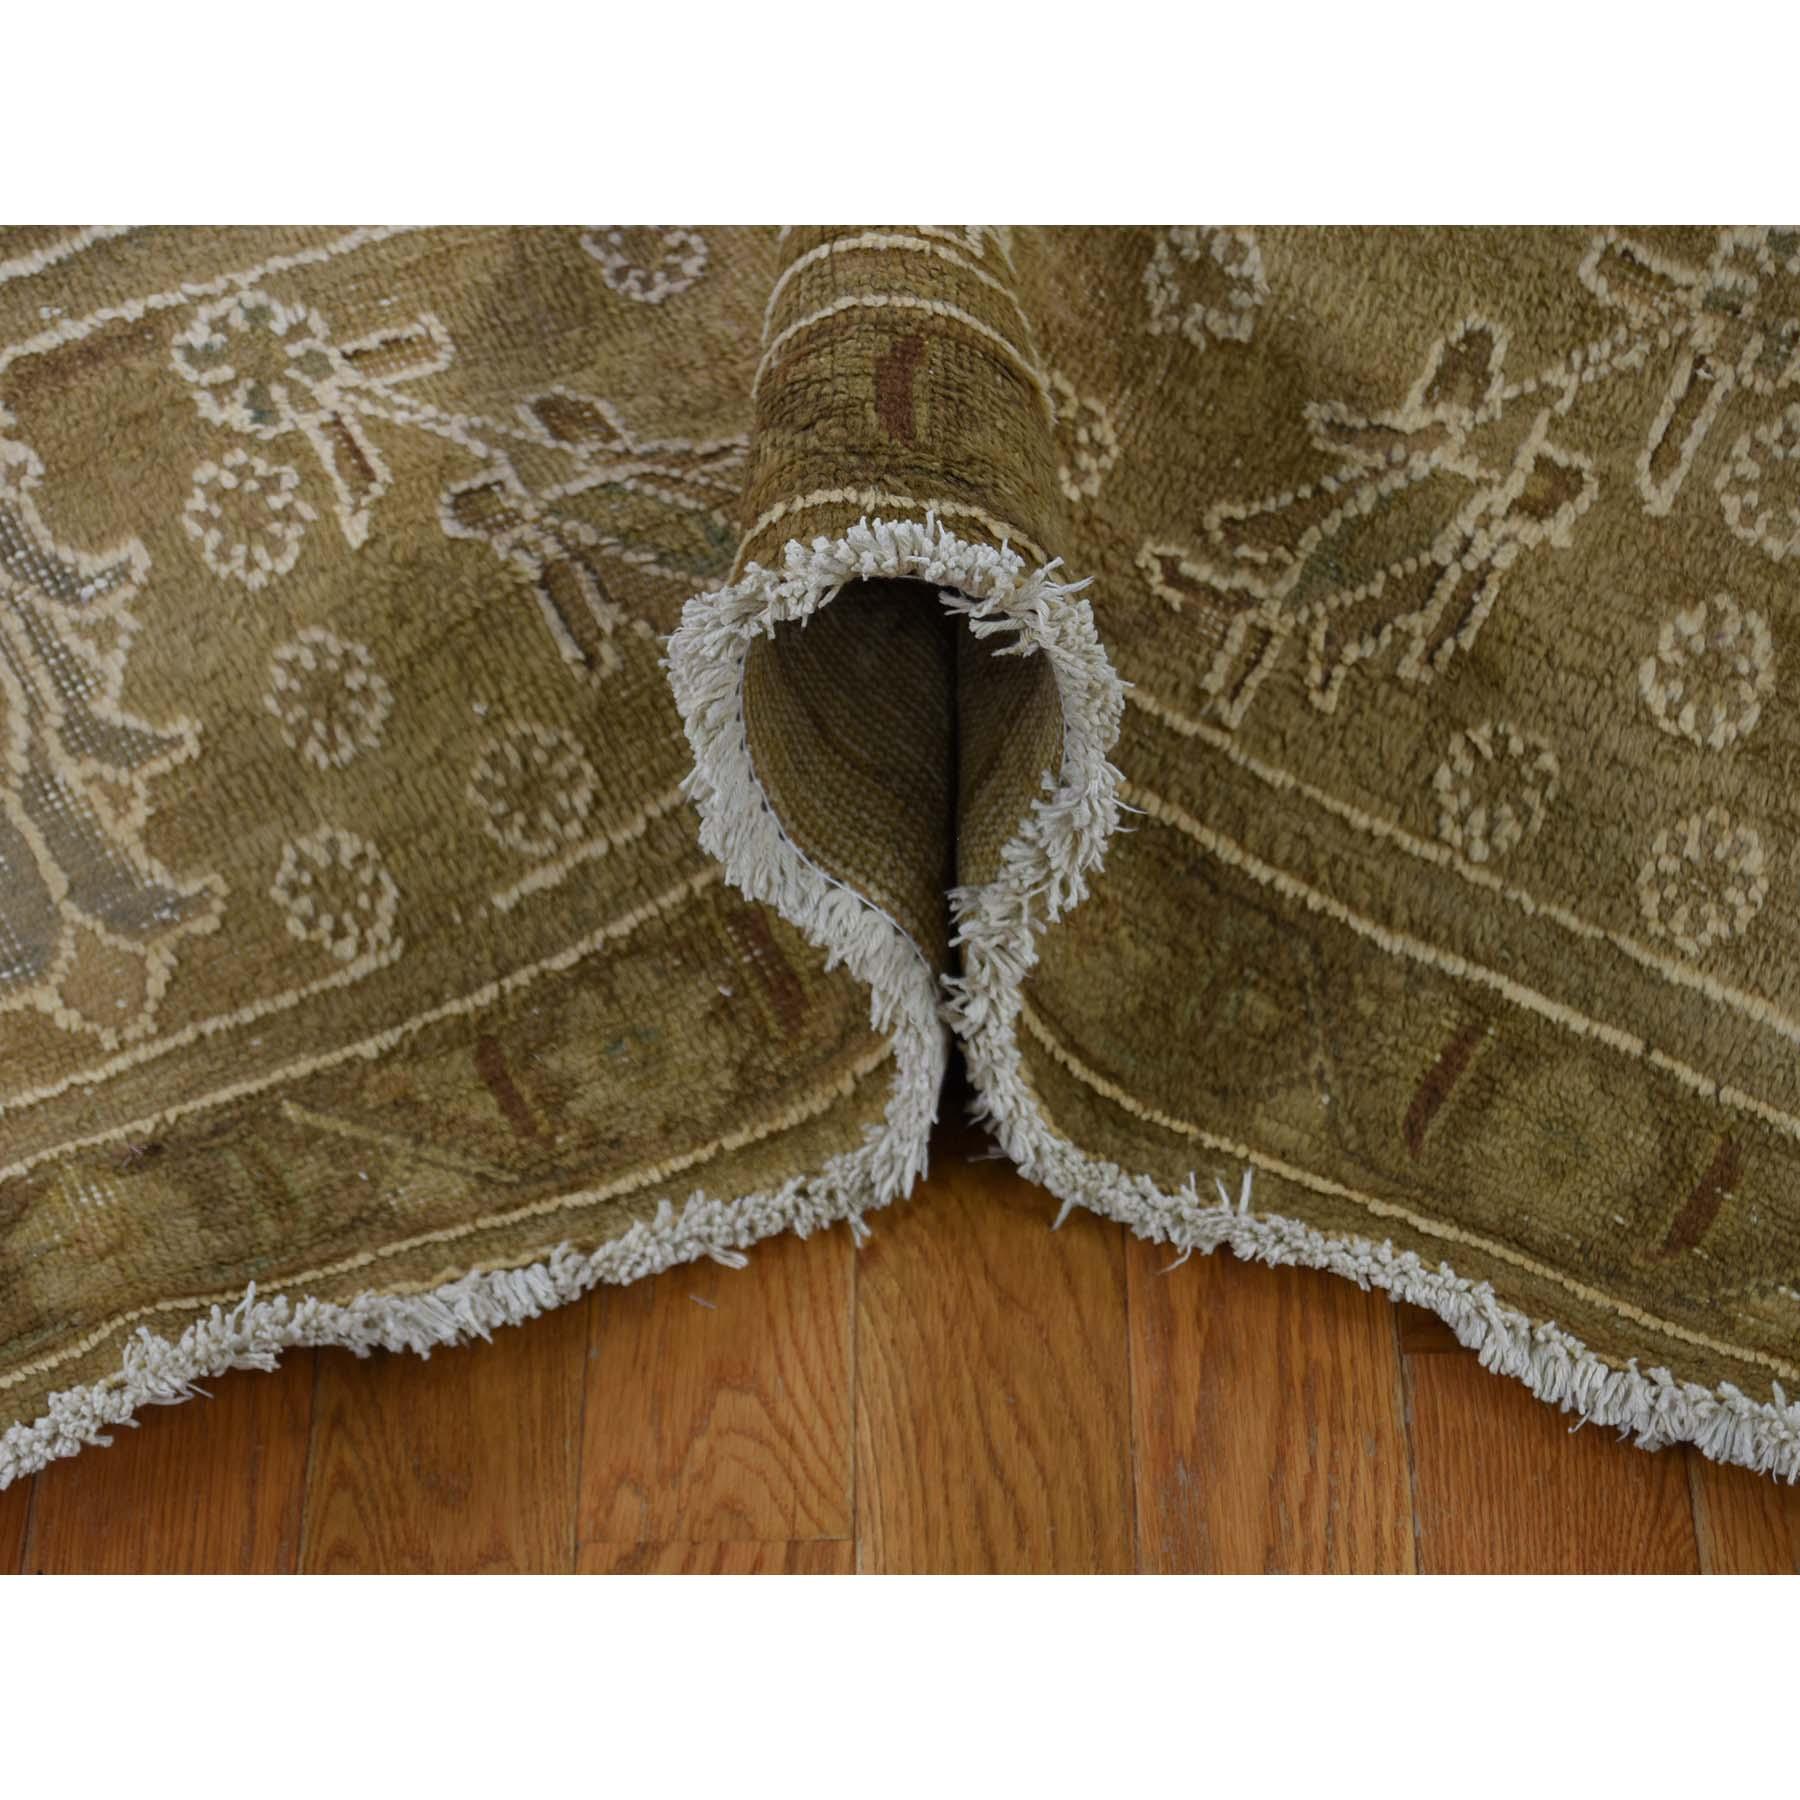 10-1 x13- Hand-Knotted Pure Wool Vintage Tabriz Oriental Rug